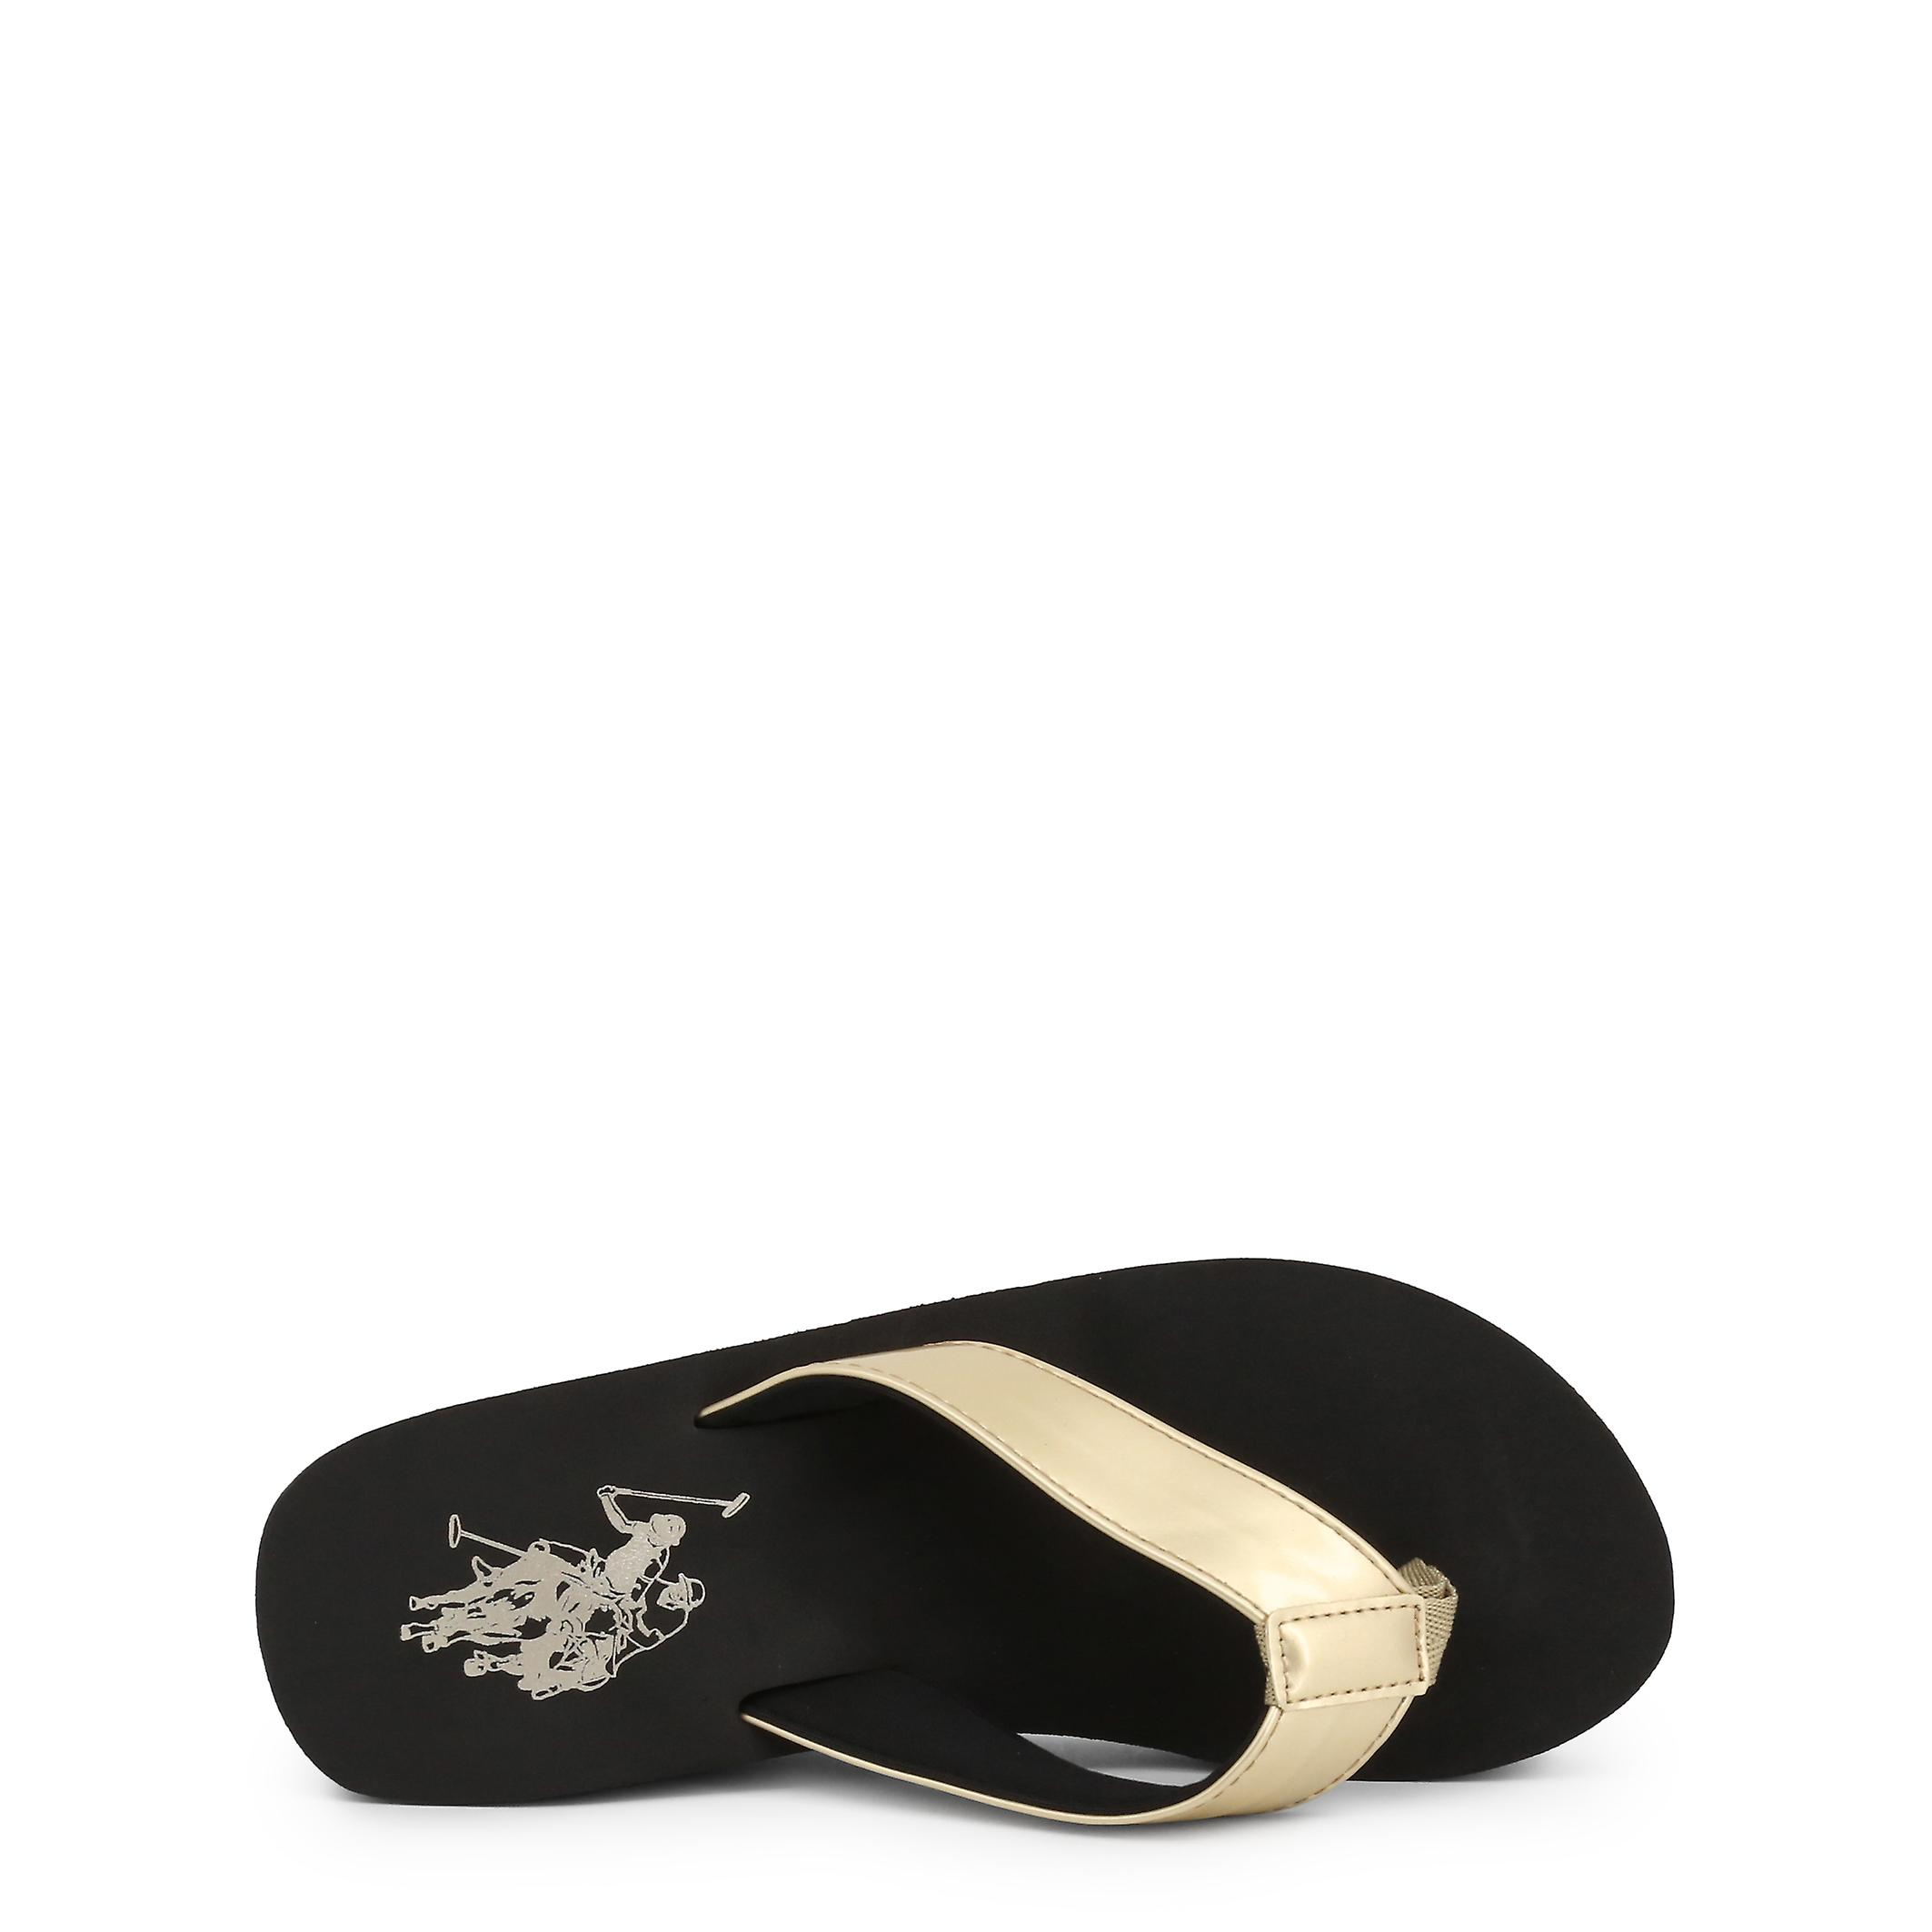 U.s. Polo Assn. Original Women Spring/summer Flip Flops Black Color - 73278